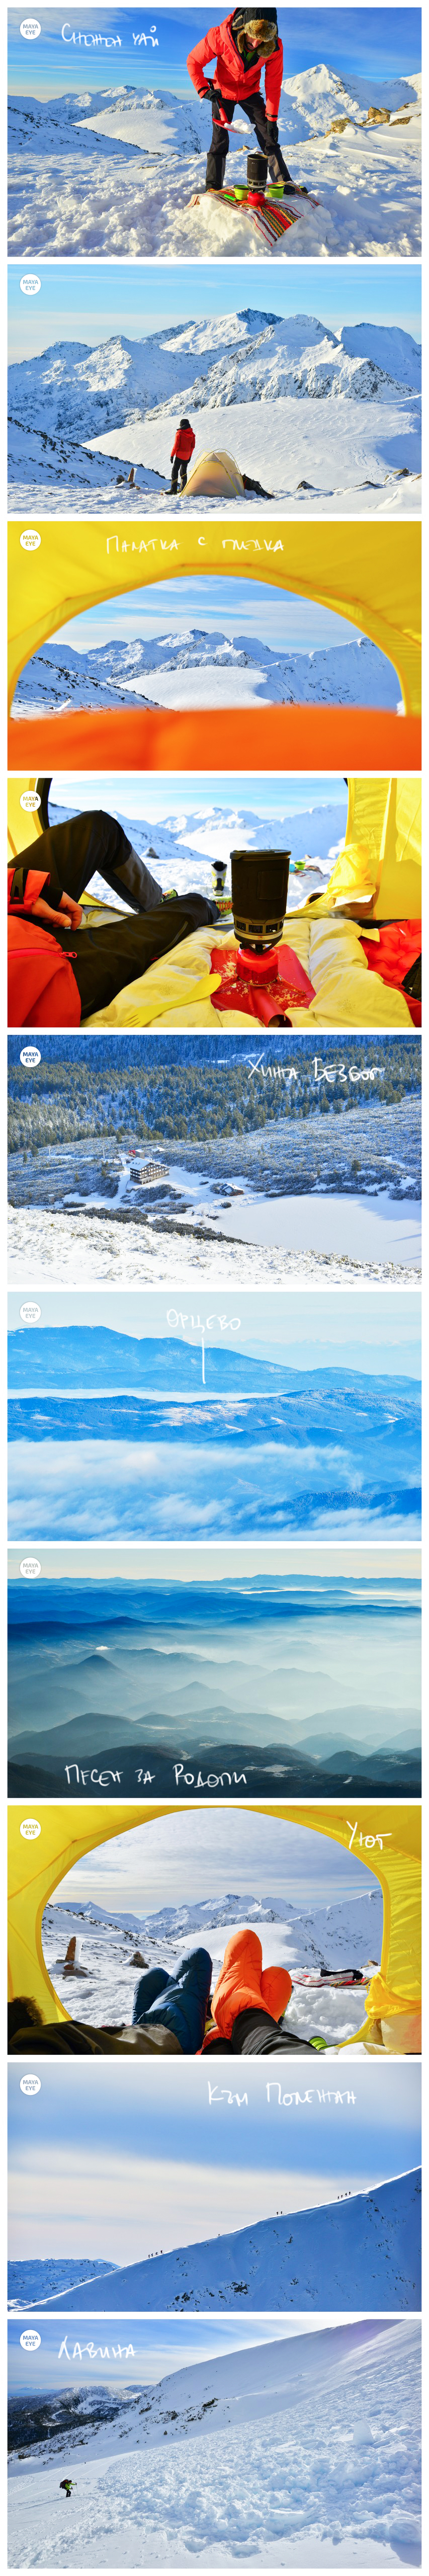 Безбог Пирин изгрев зима